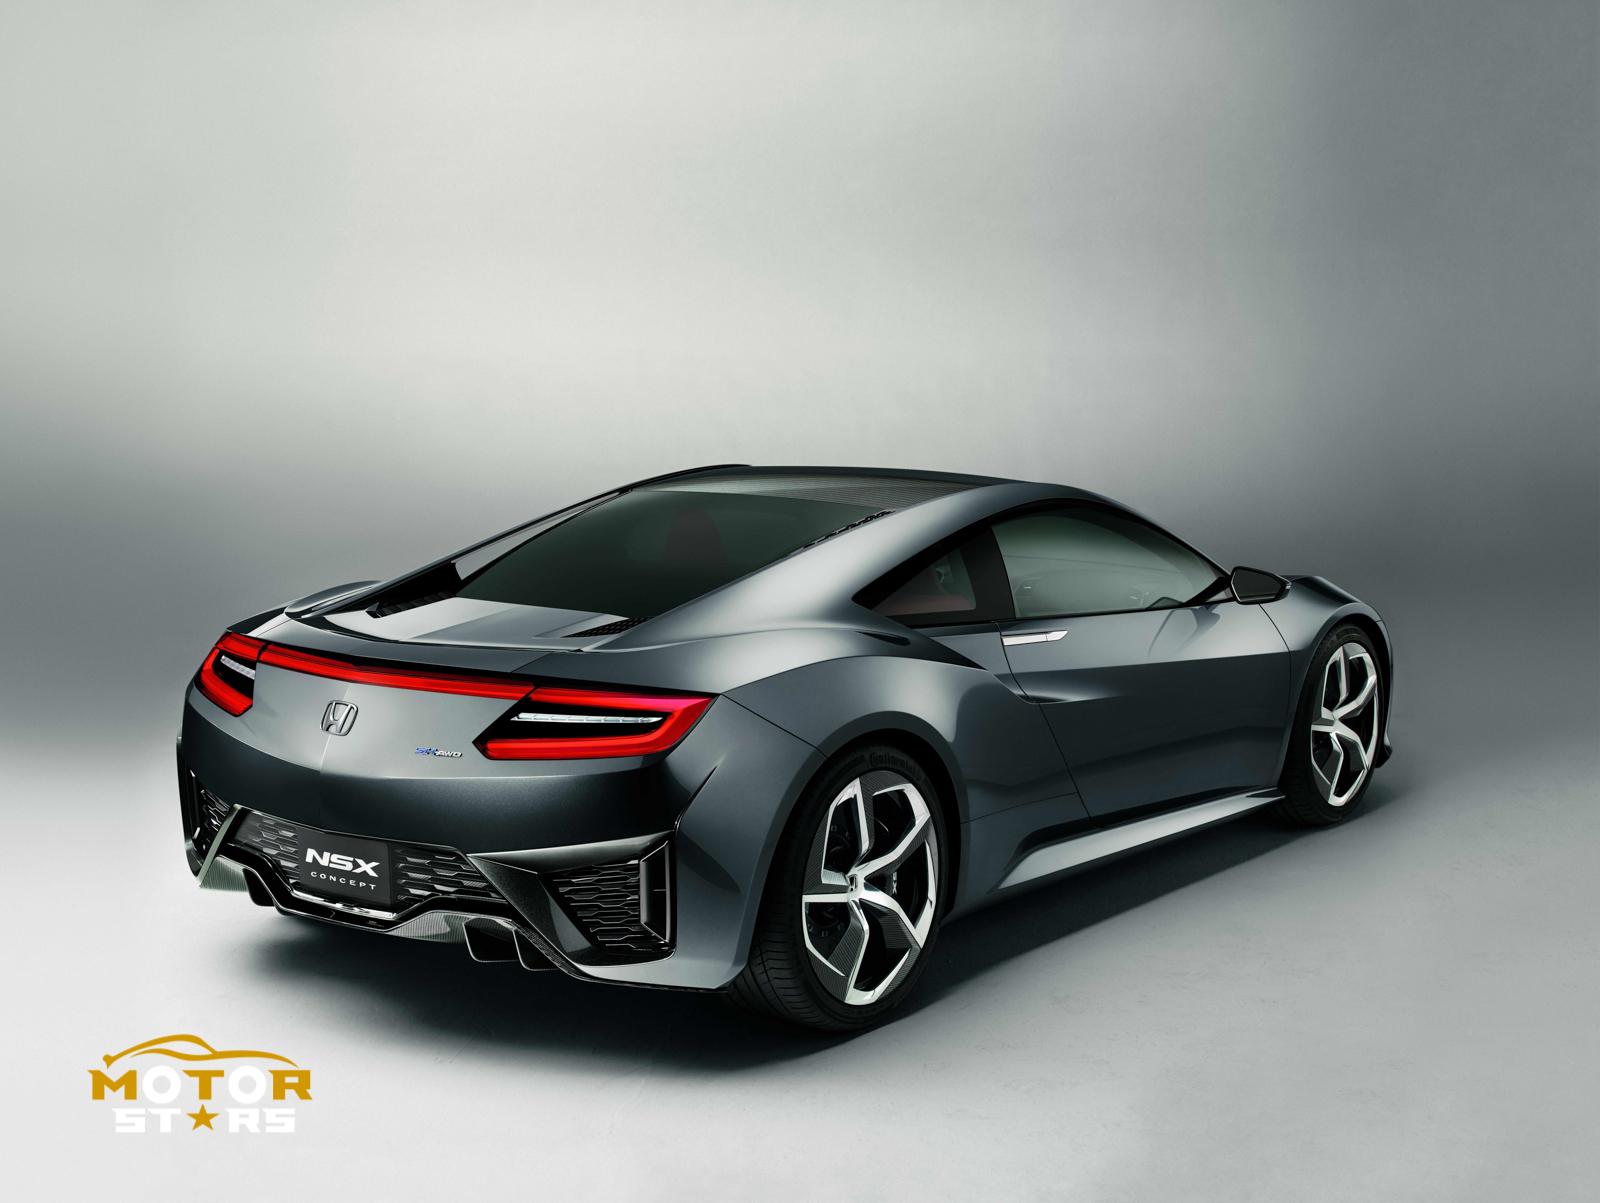 Honda Acura Nsx 2015 Hybrid Electric Supercar 21 2013 Concept Rear View Motorstars